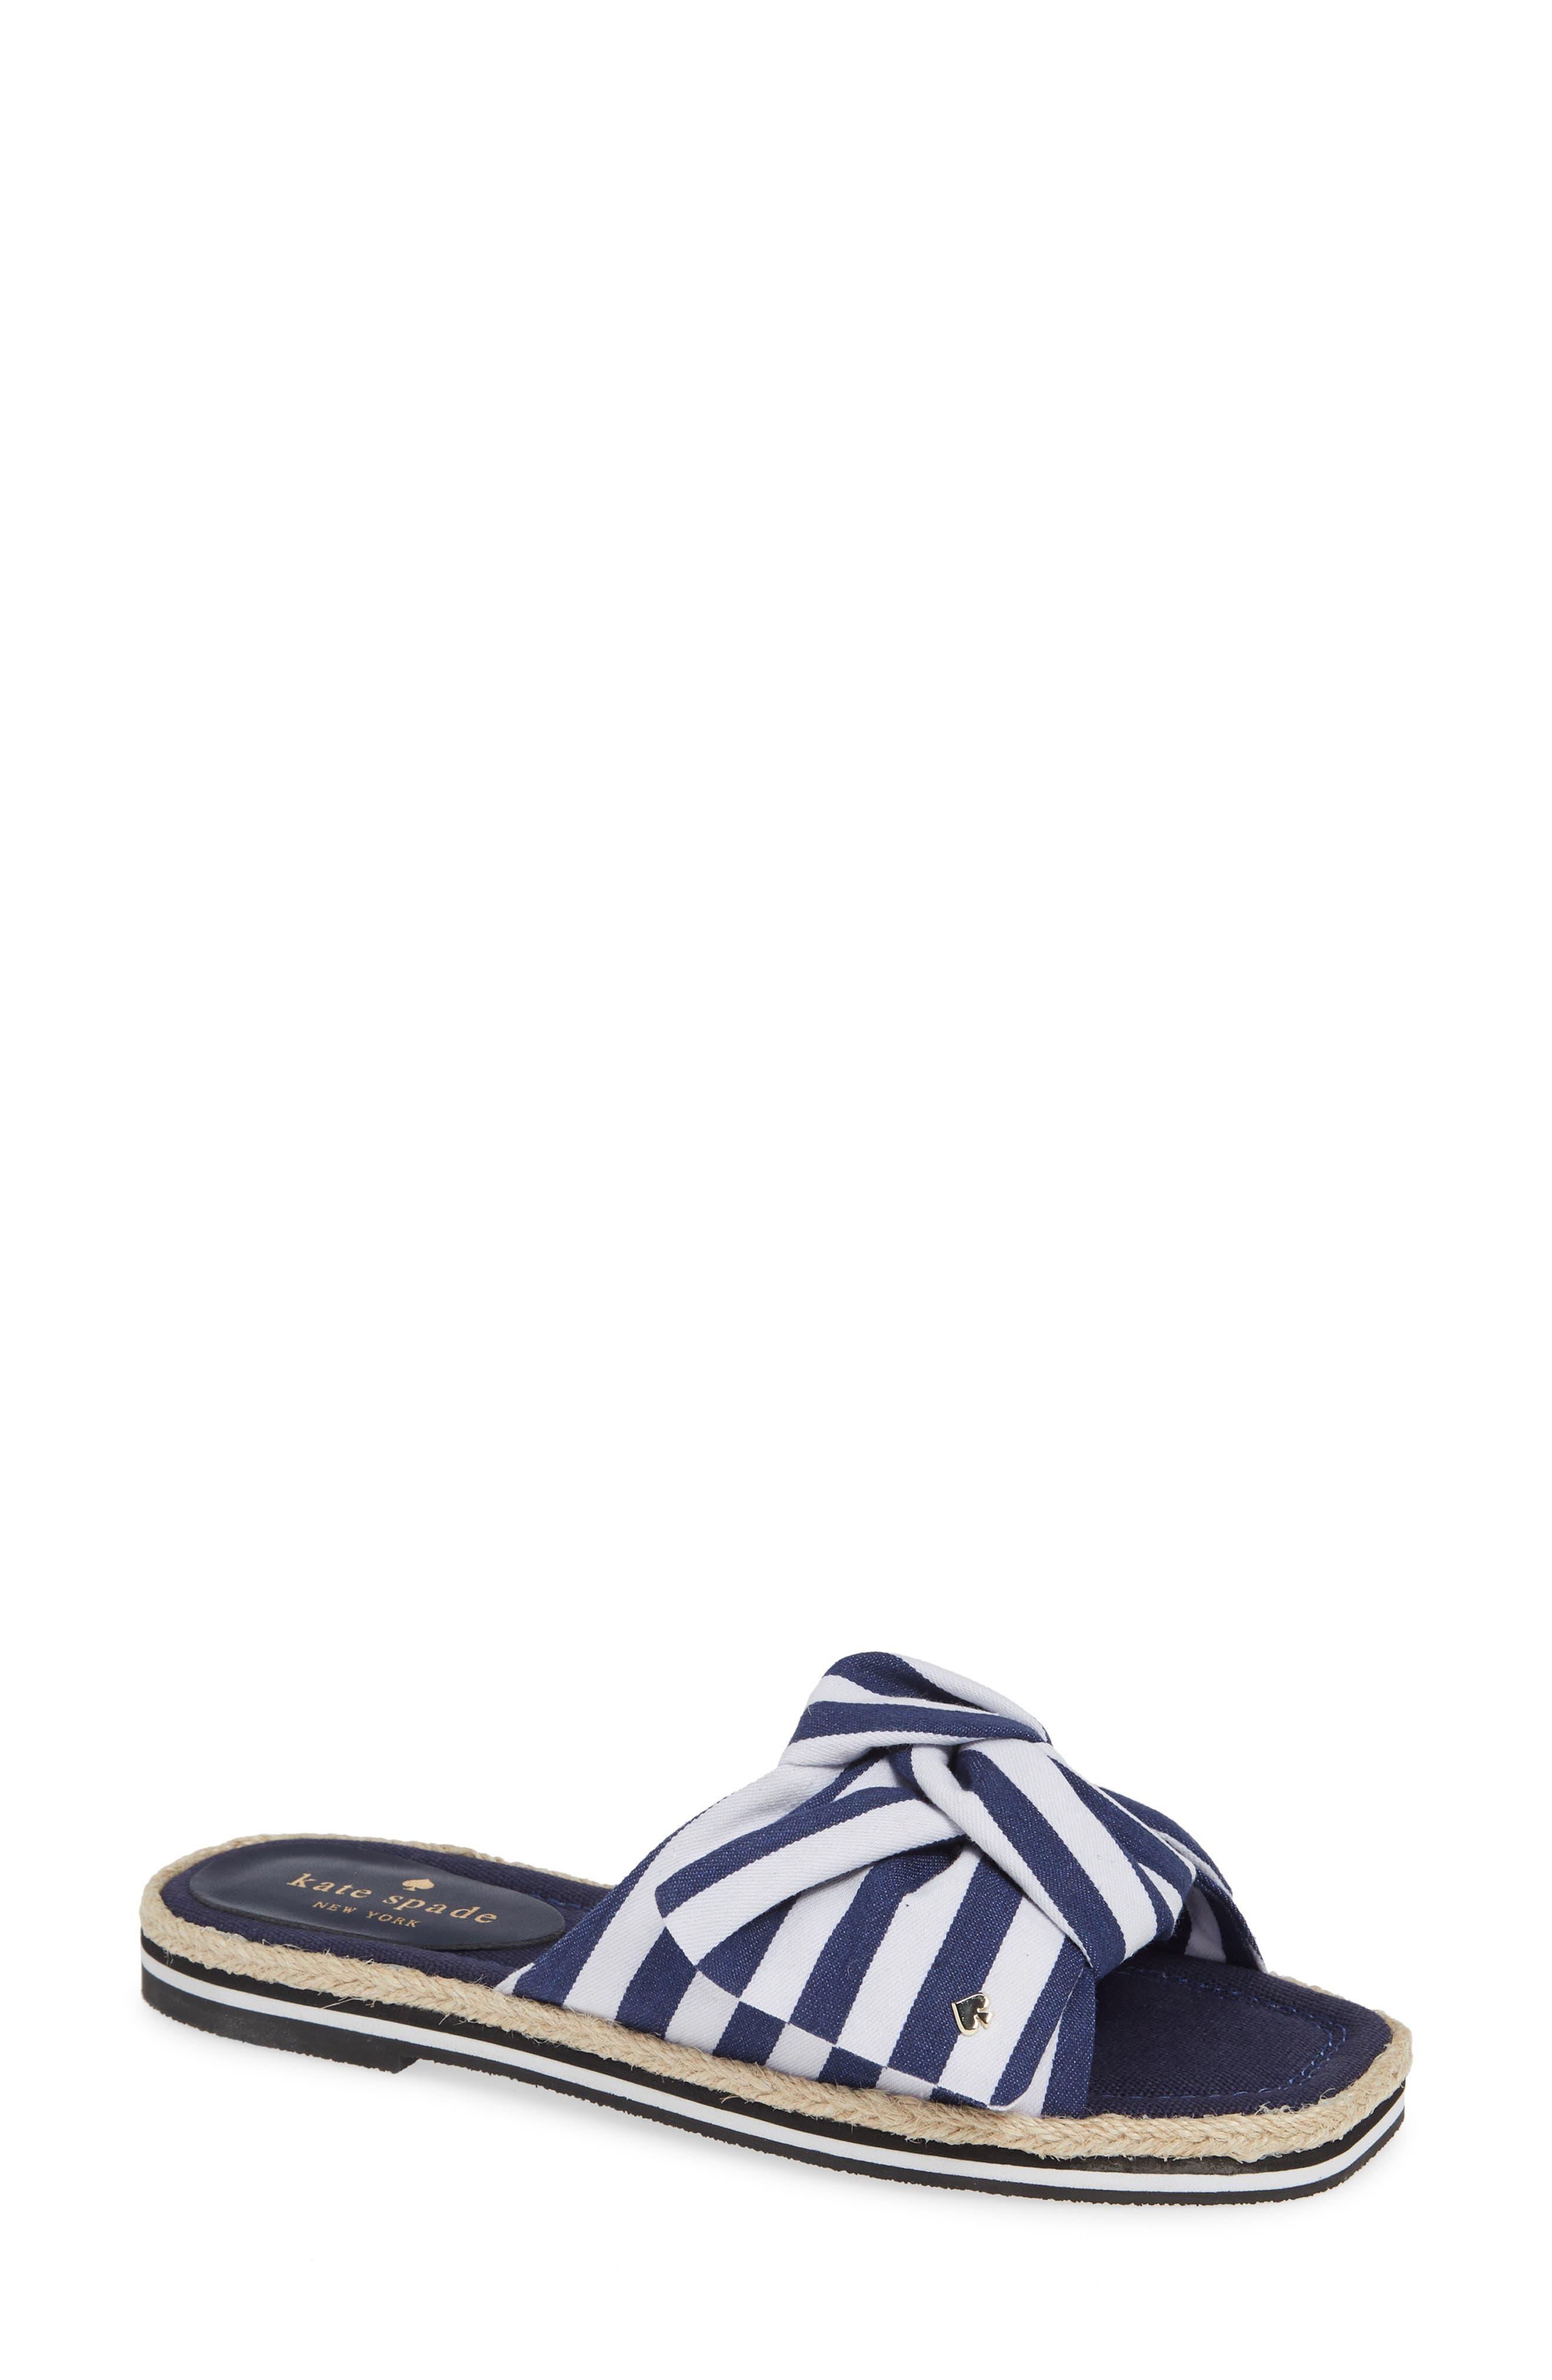 1e1351218f2a Kate Spade New York Caliana Stripe Slide Sandal